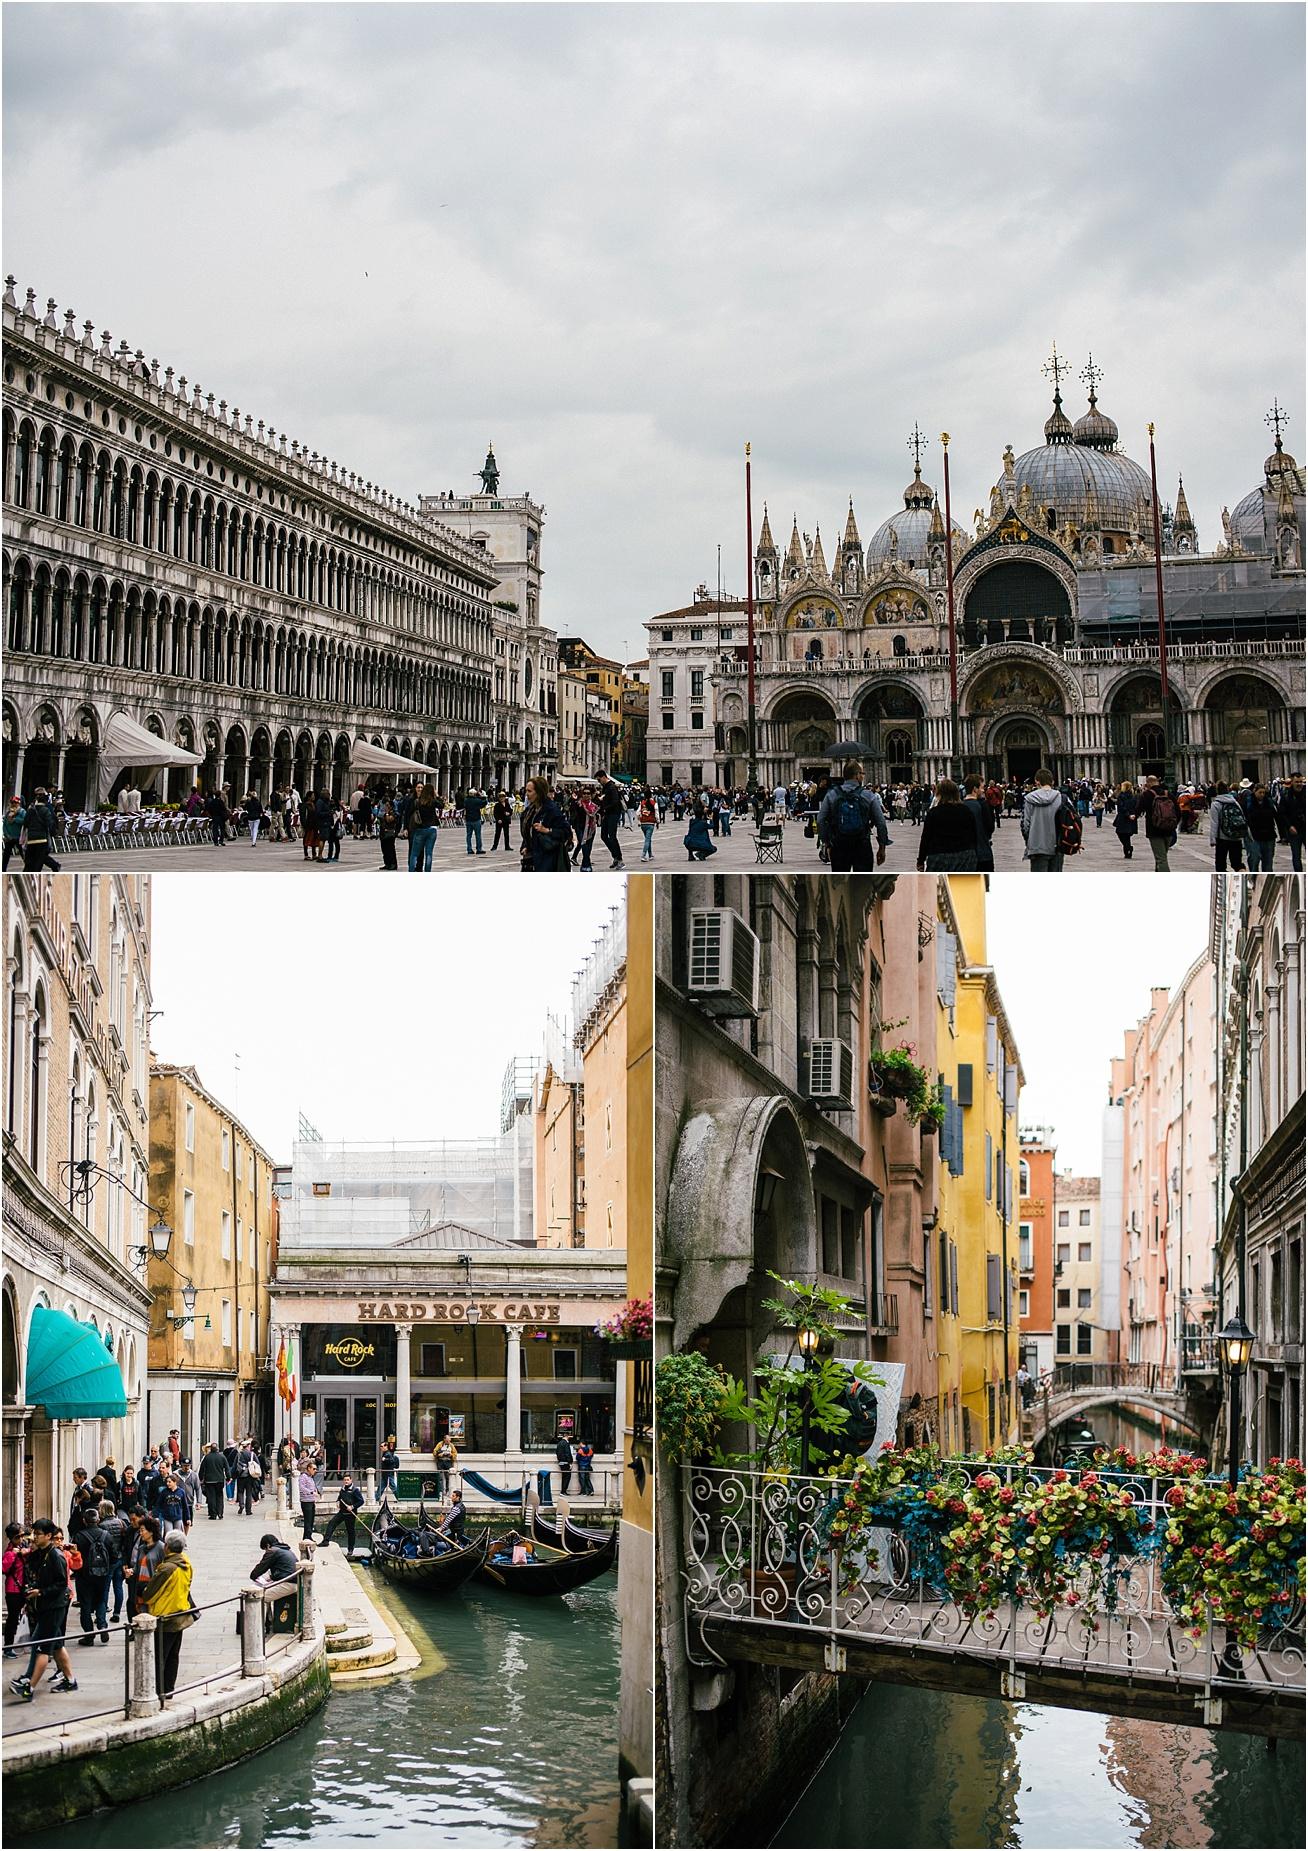 Travel in Venice, Italy